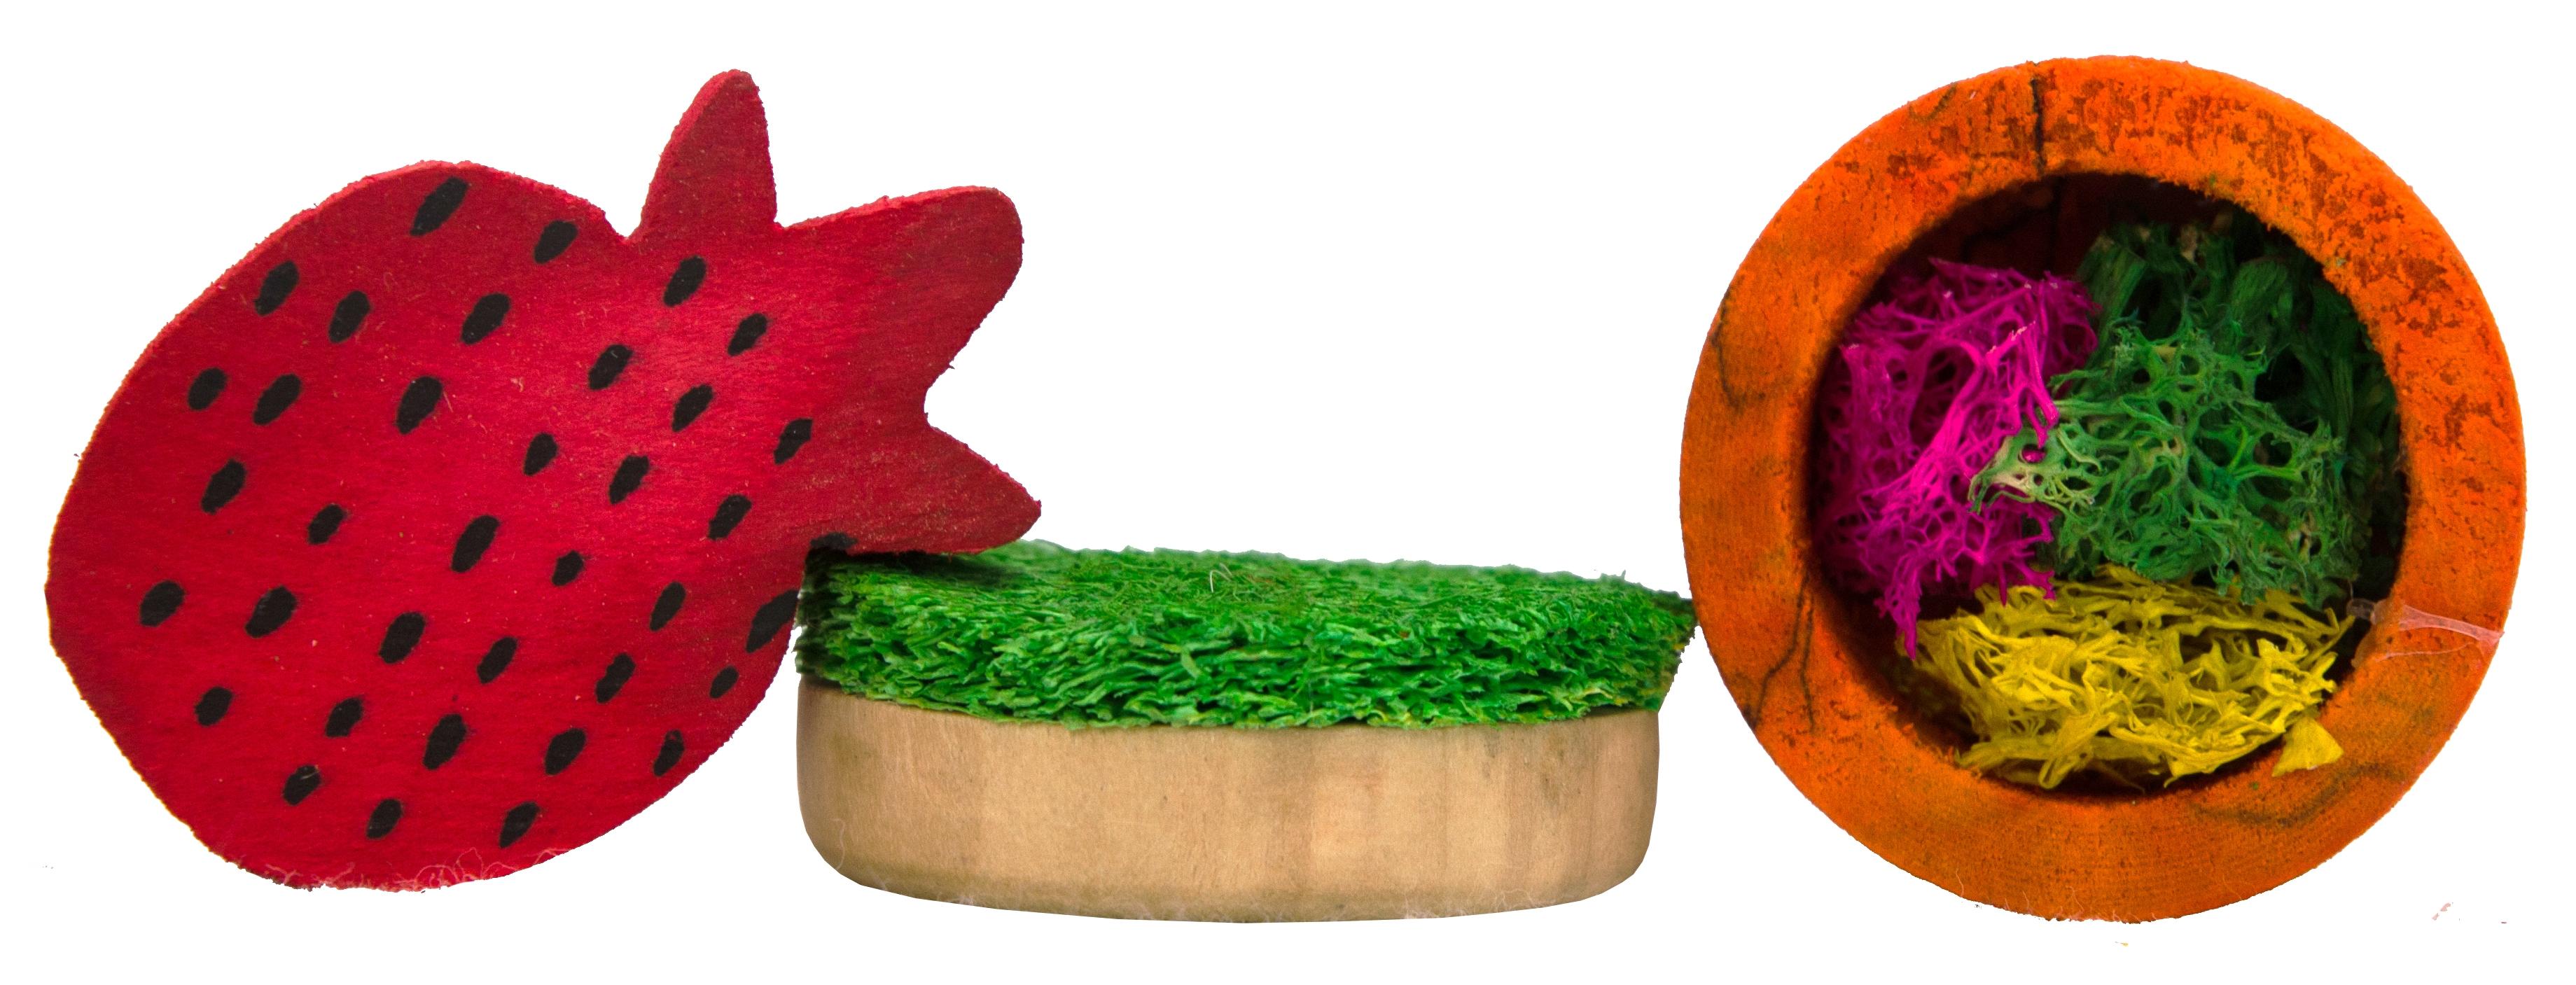 Wood'n Loofah Pretty Toys no.1